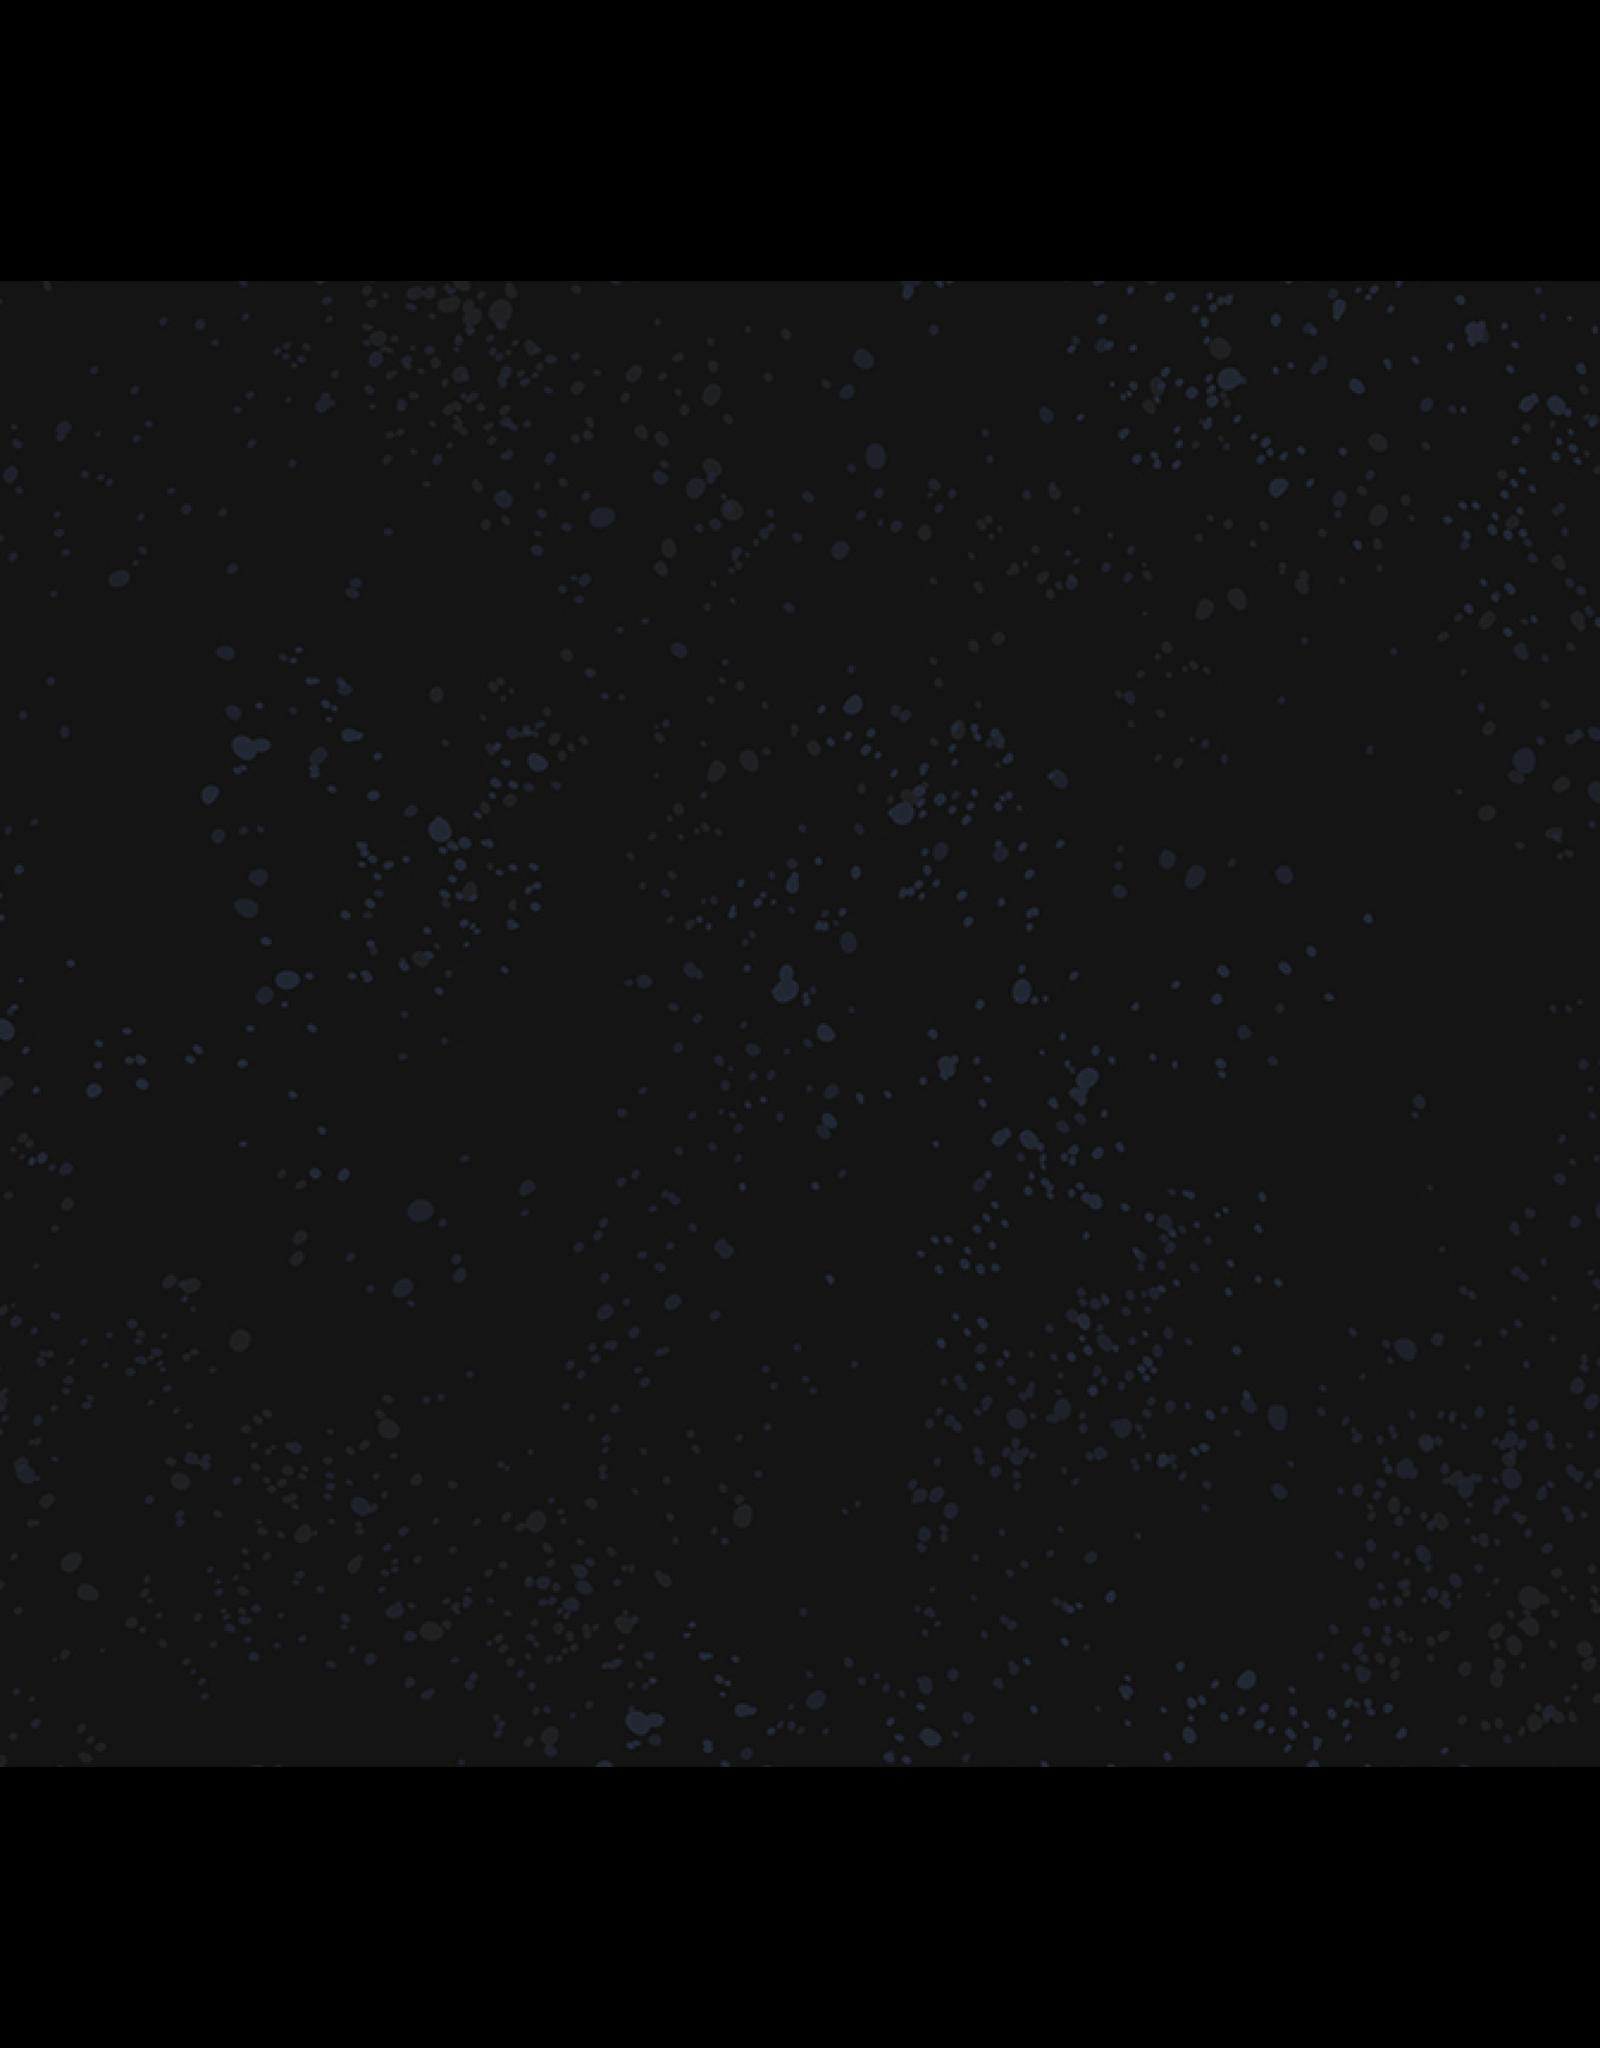 Rashida Coleman-Hale Ruby Star Society, Speckled New in Onyx, Fabric Half-Yards